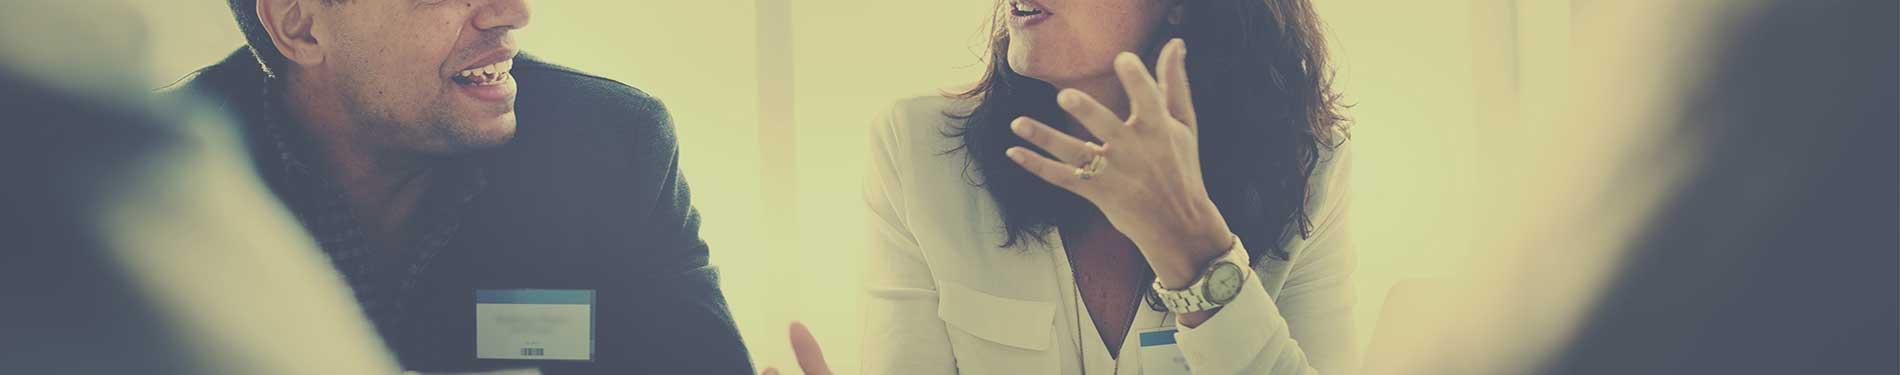 Banner Testimonials | Cartin Coaching and Management